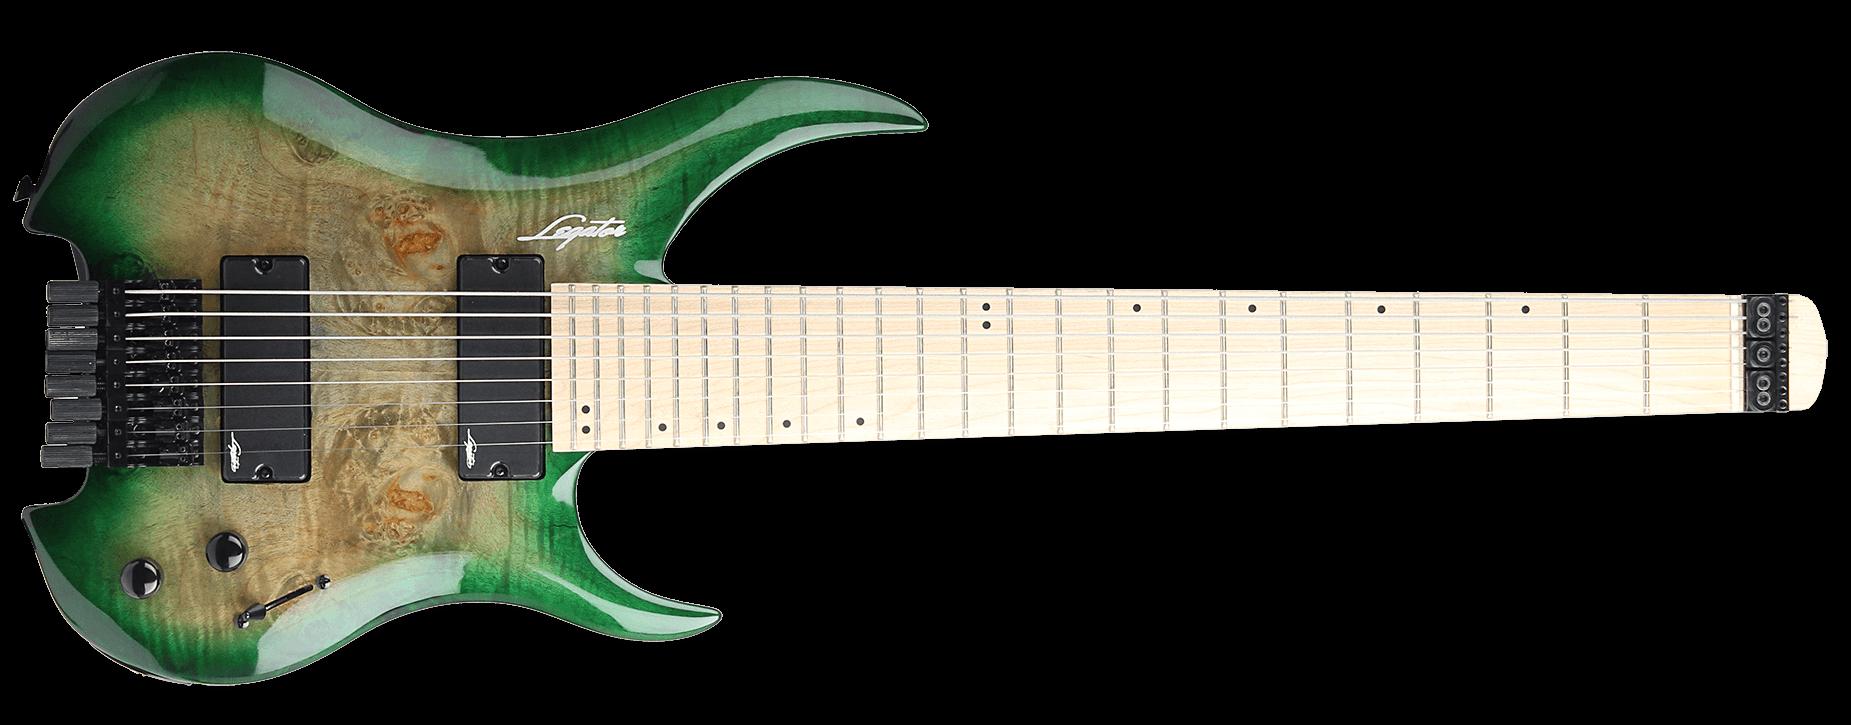 Legator Ghost 200-SE 8 Emerald Burst Burl